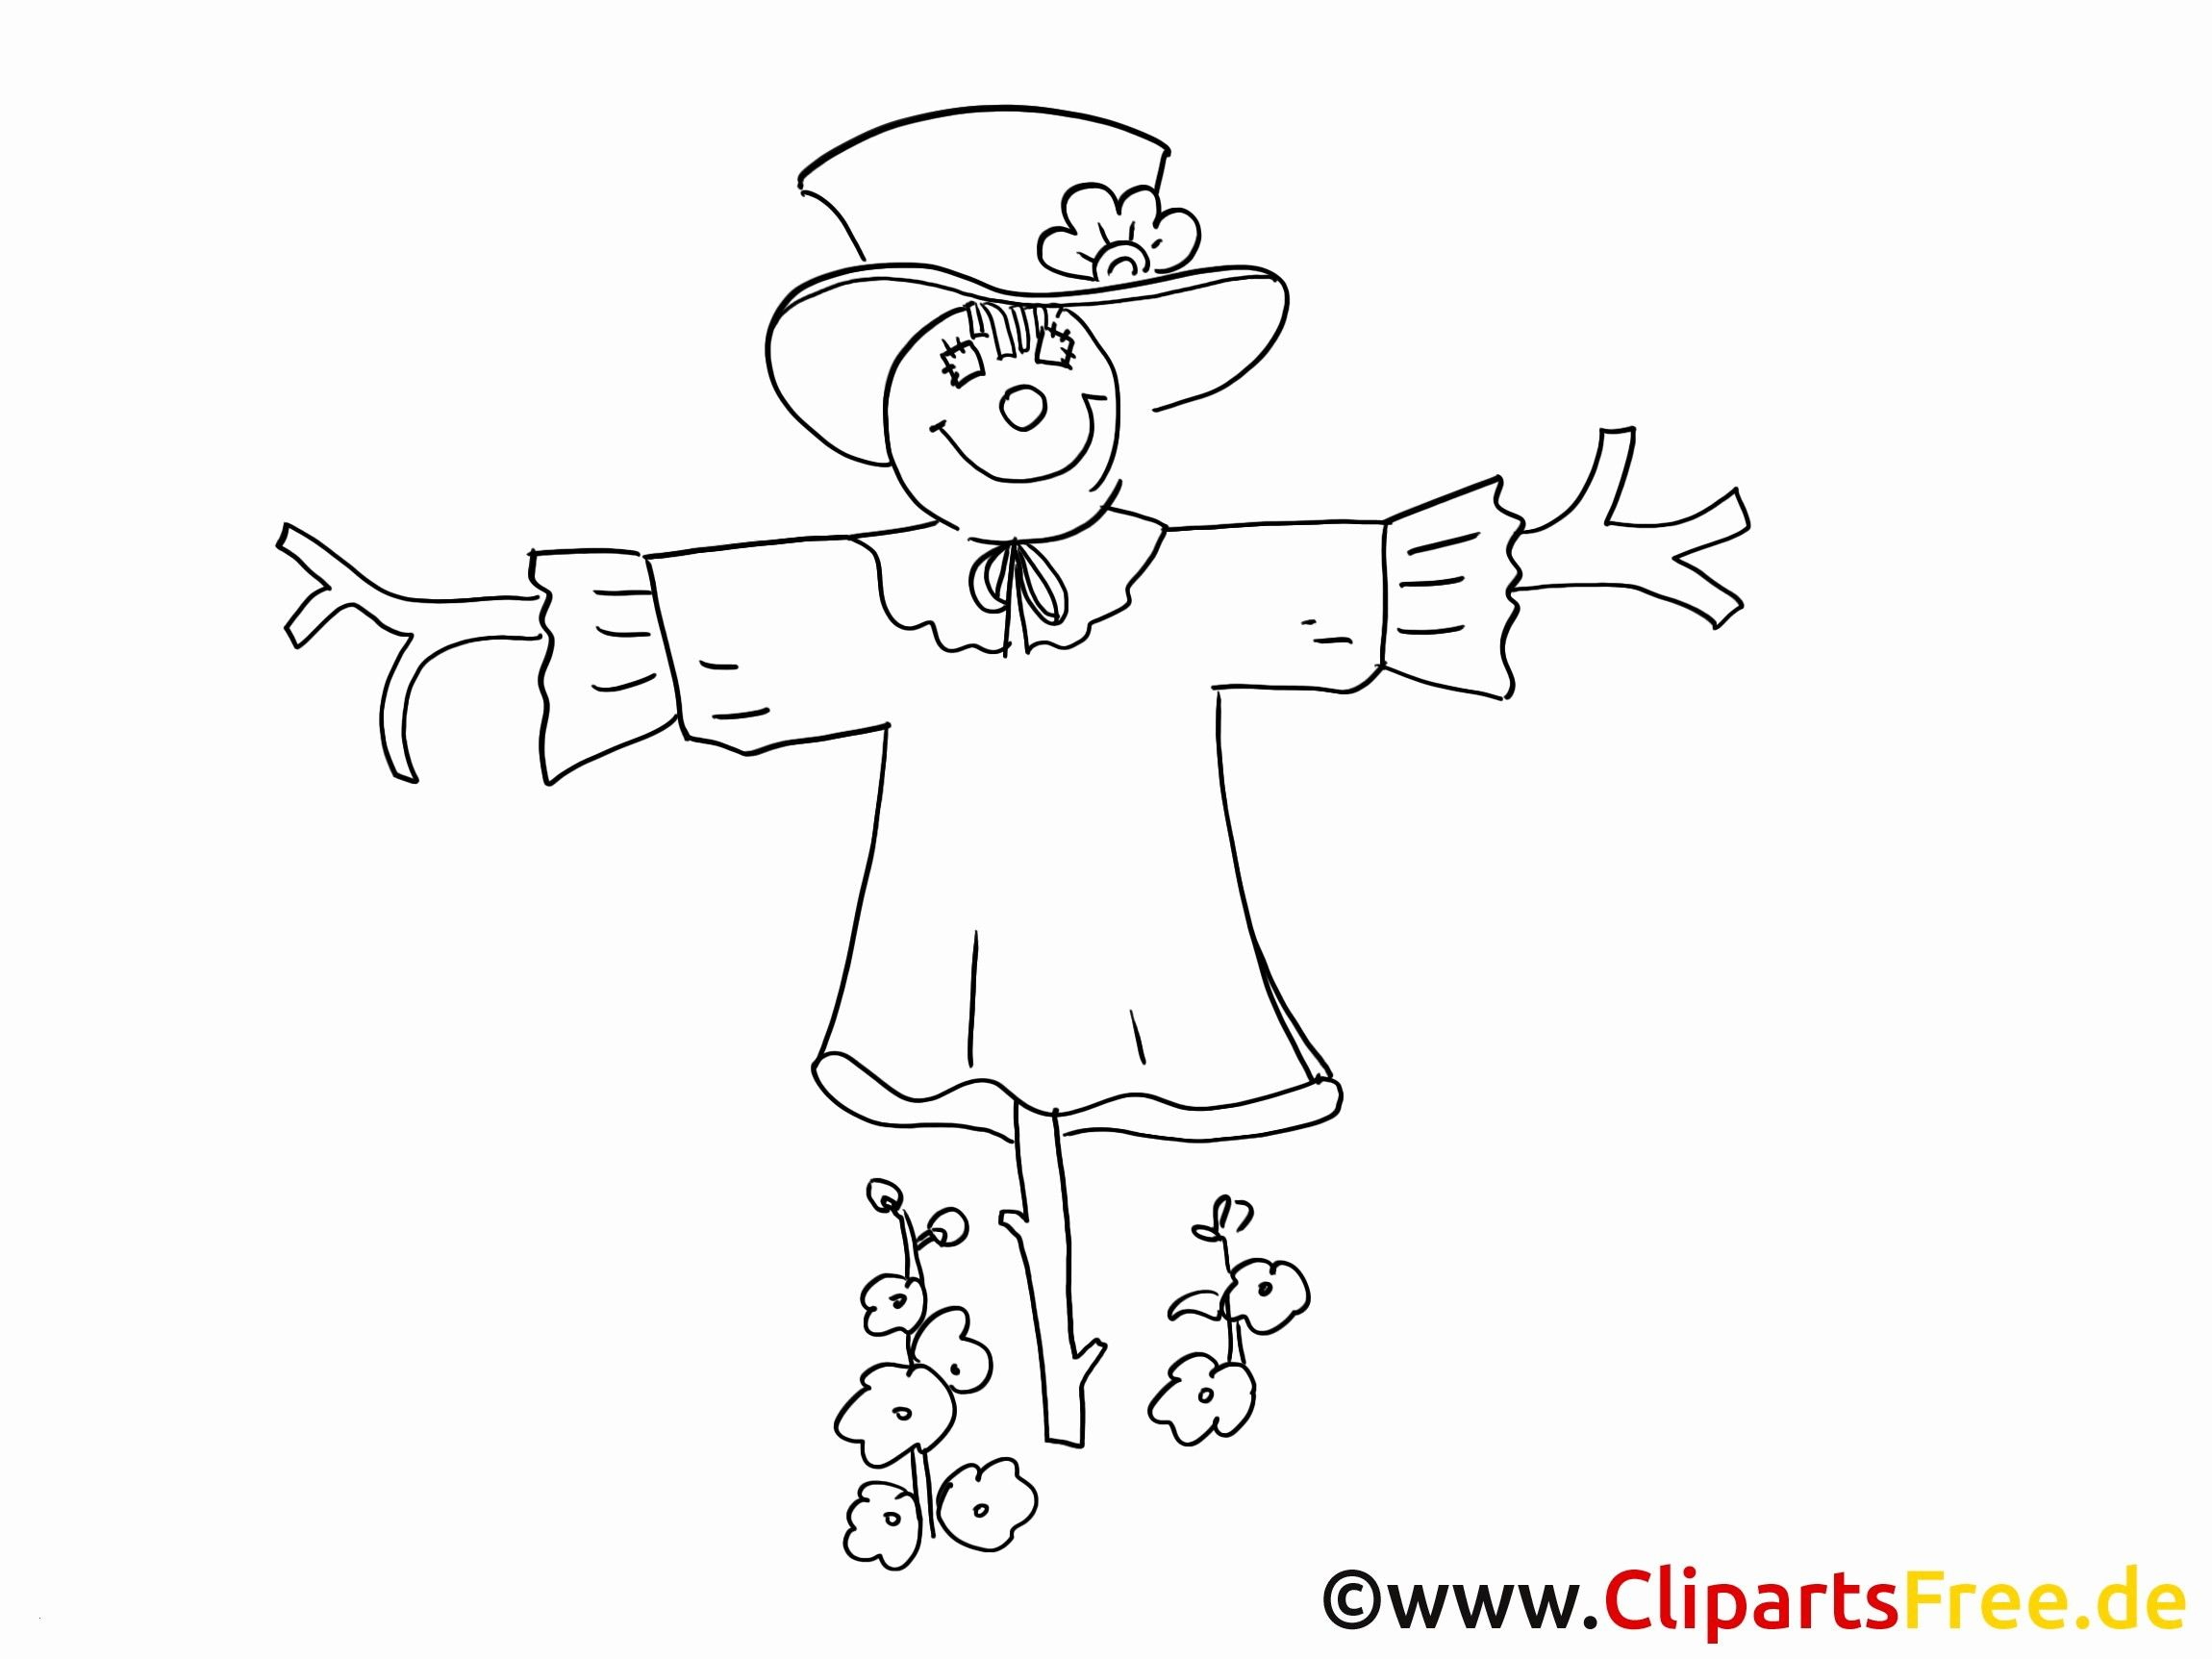 Neu Malvorlagen Anna Und Elsa Kostenlos Elsa Art Fictional Characters